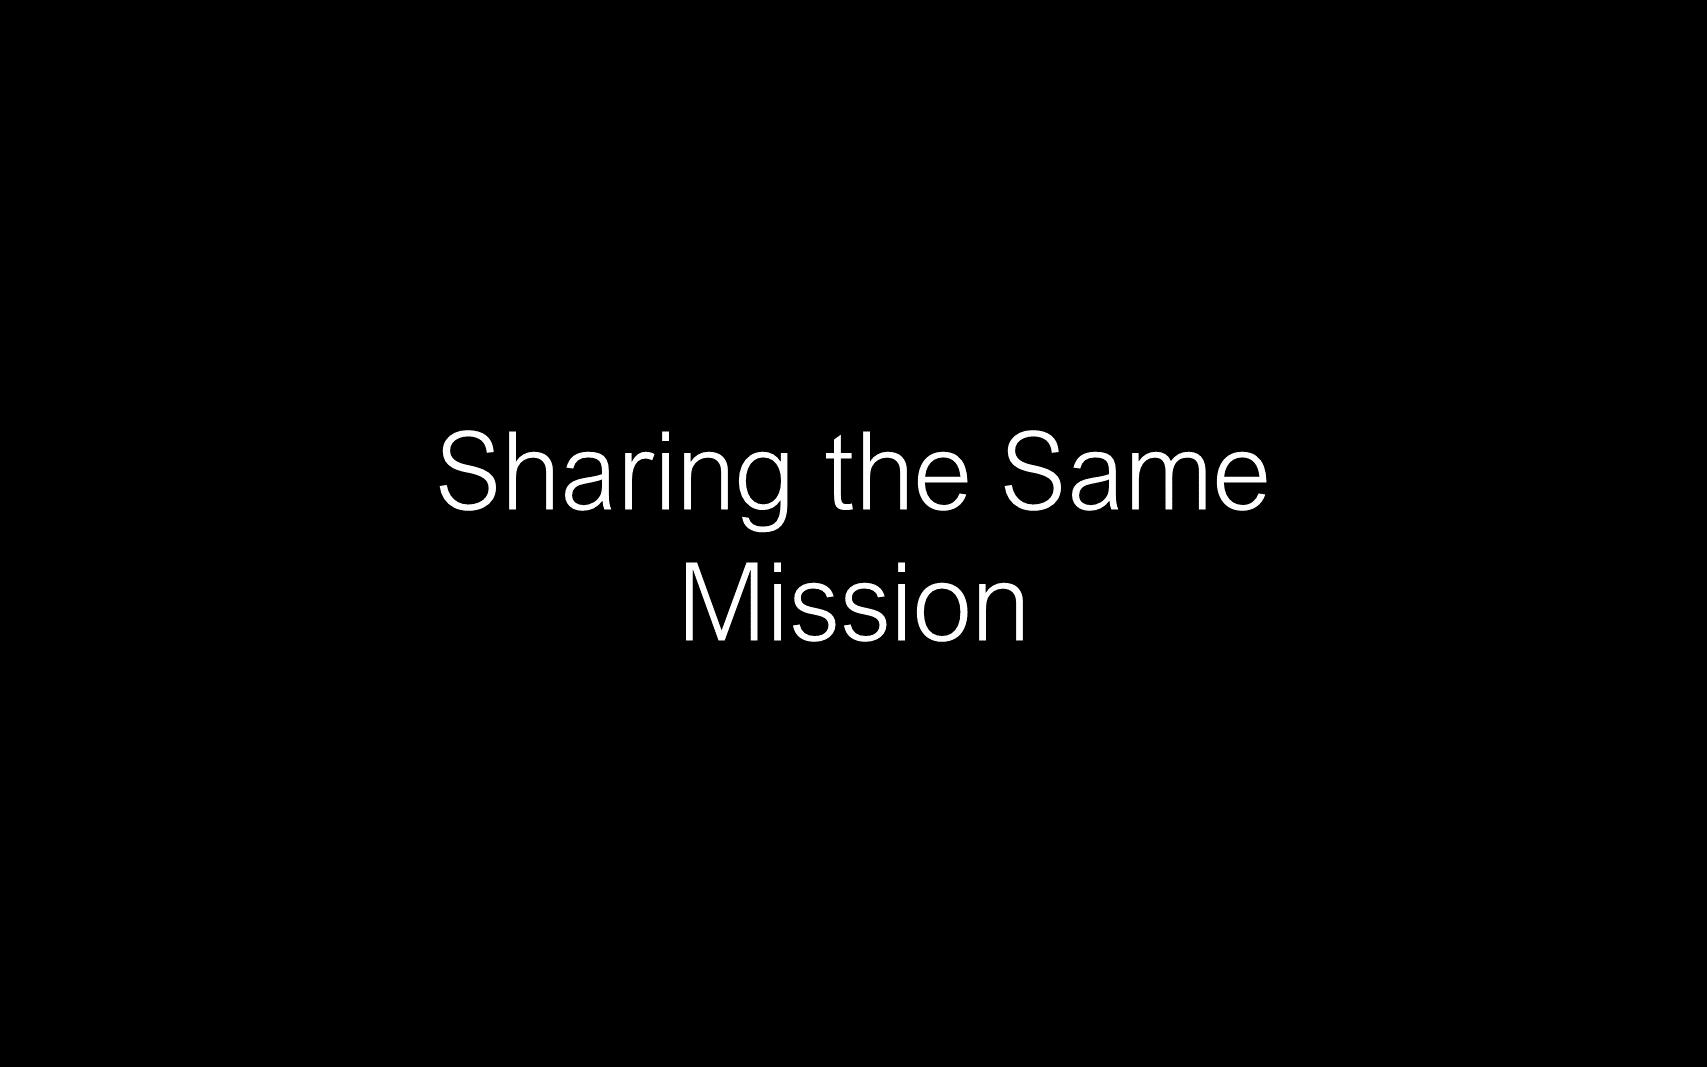 ESH-14 - The Discipline Of Disciple-Making - Sharing The Same Gospel & Mission (9)